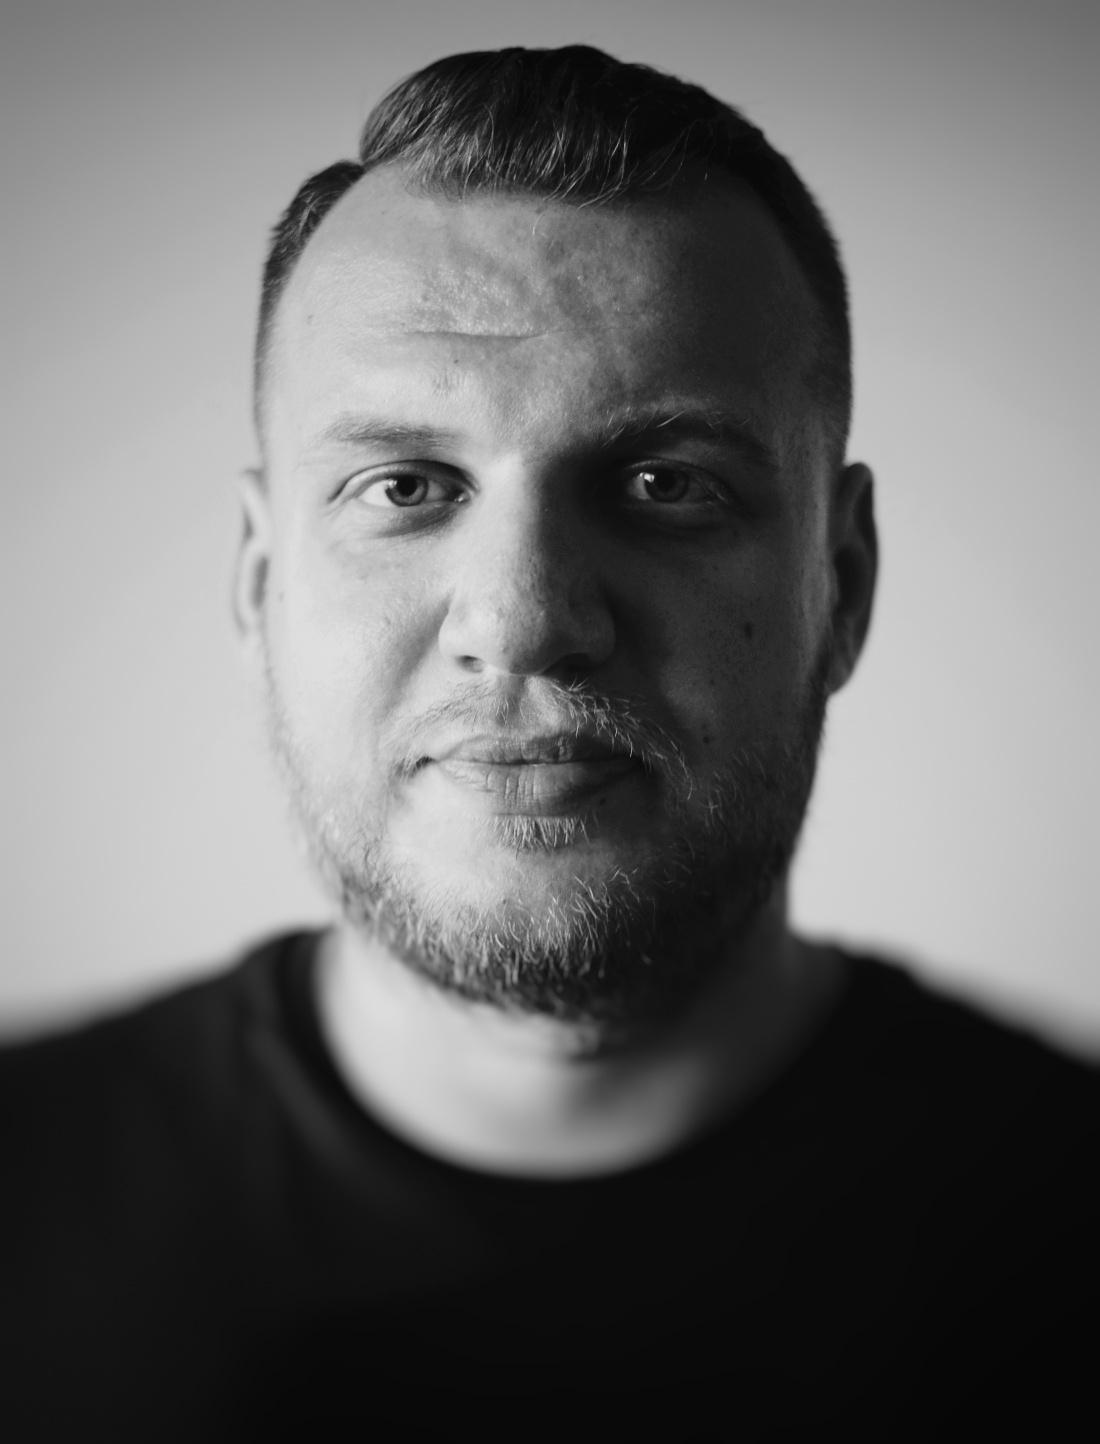 Matúš Vencúrik